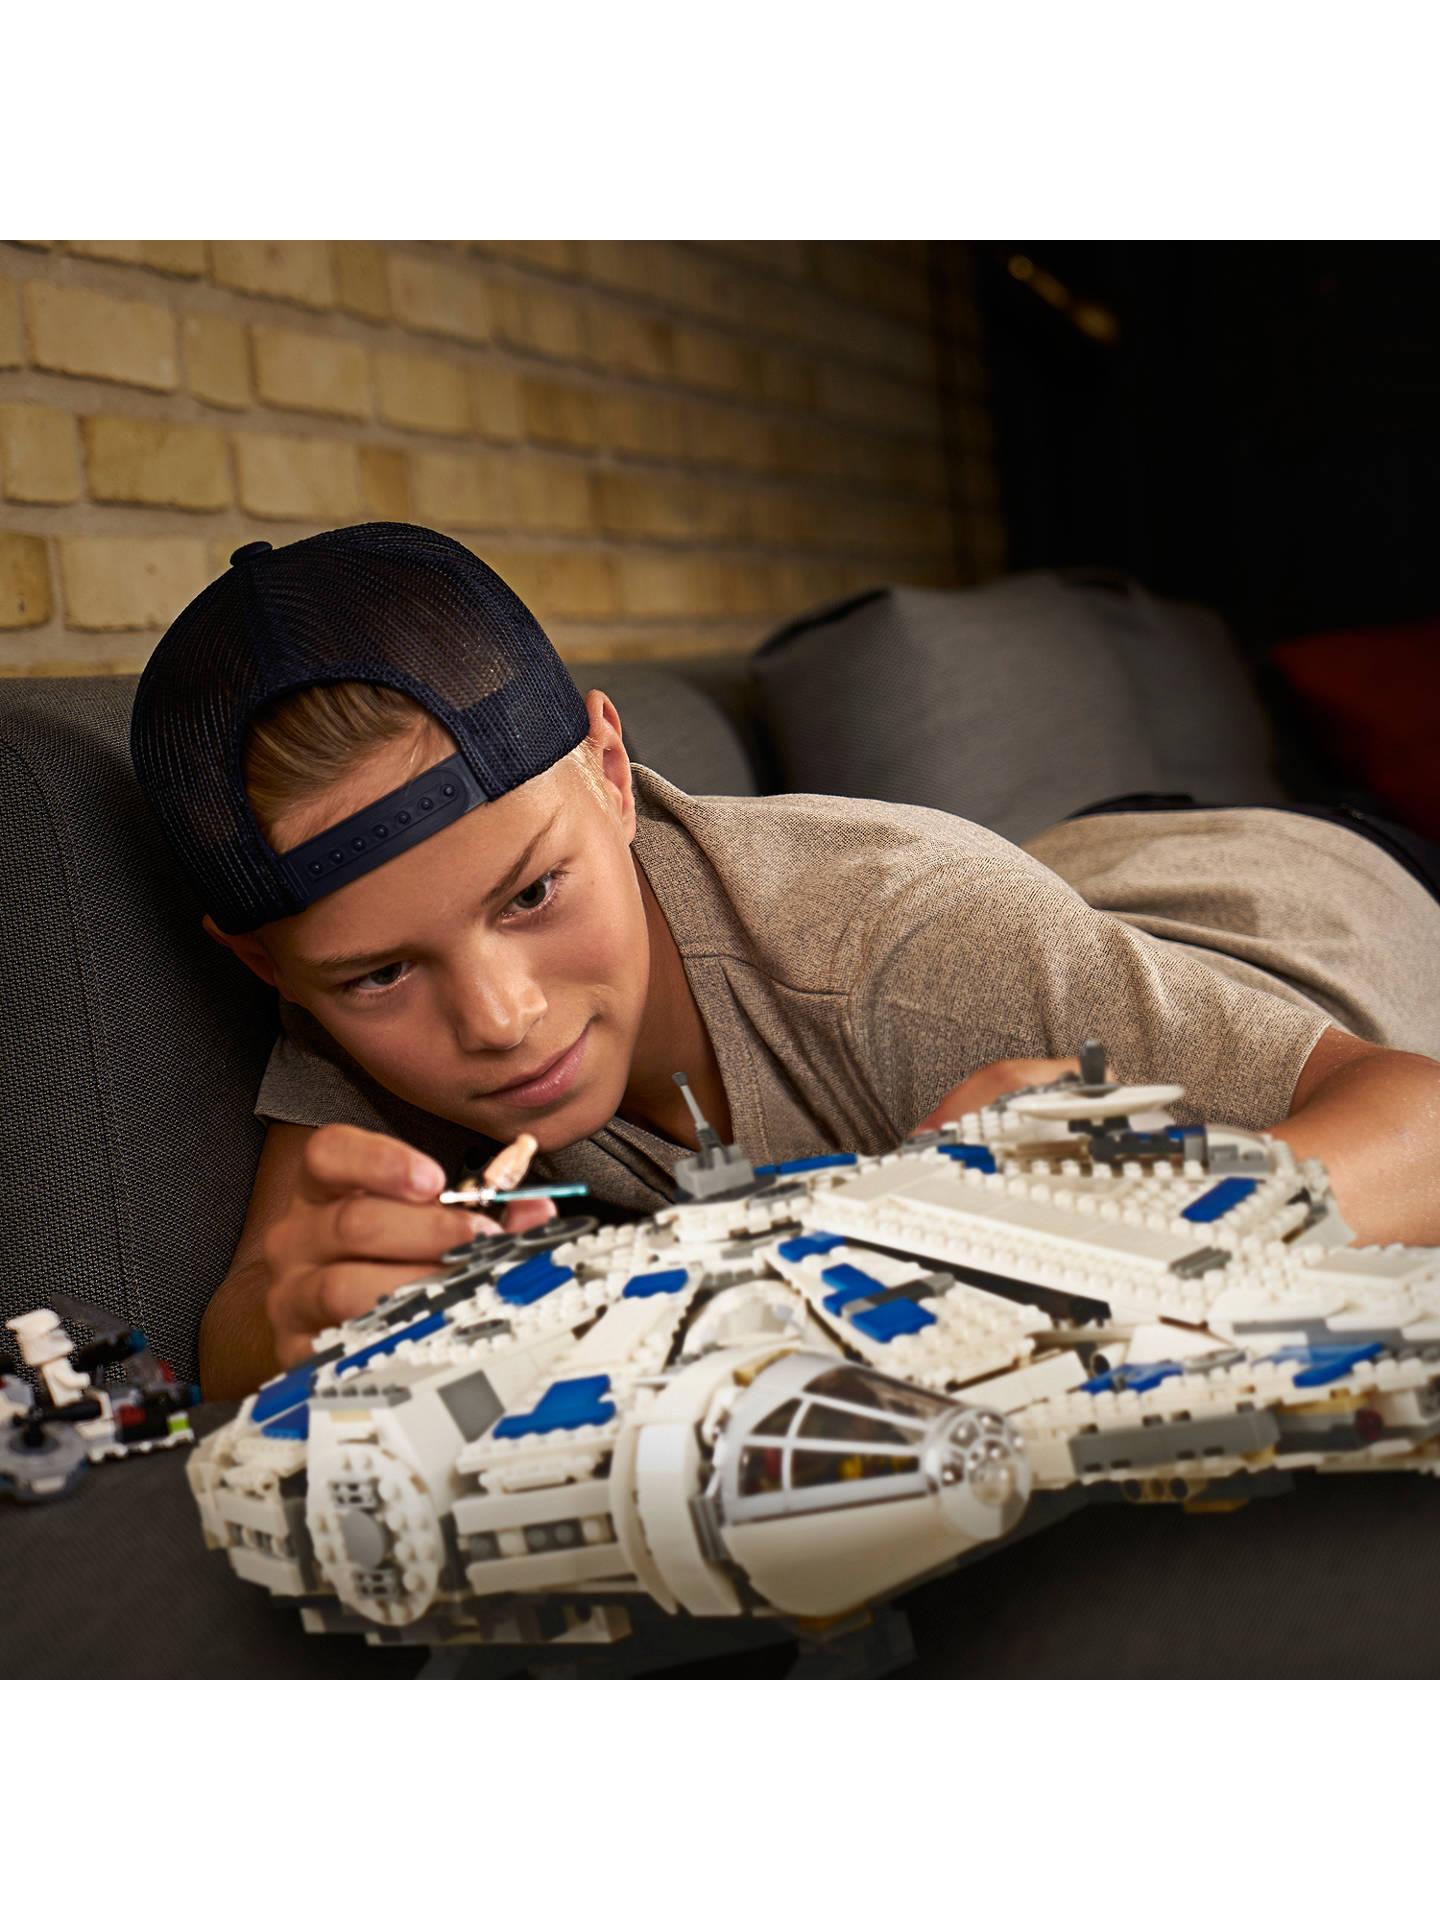 5d4a515fd8a53 ... BuyLEGO Star Wars Solo  A Star Wars Story 75212 Kessel Run Millennium  Falcon Online at ...